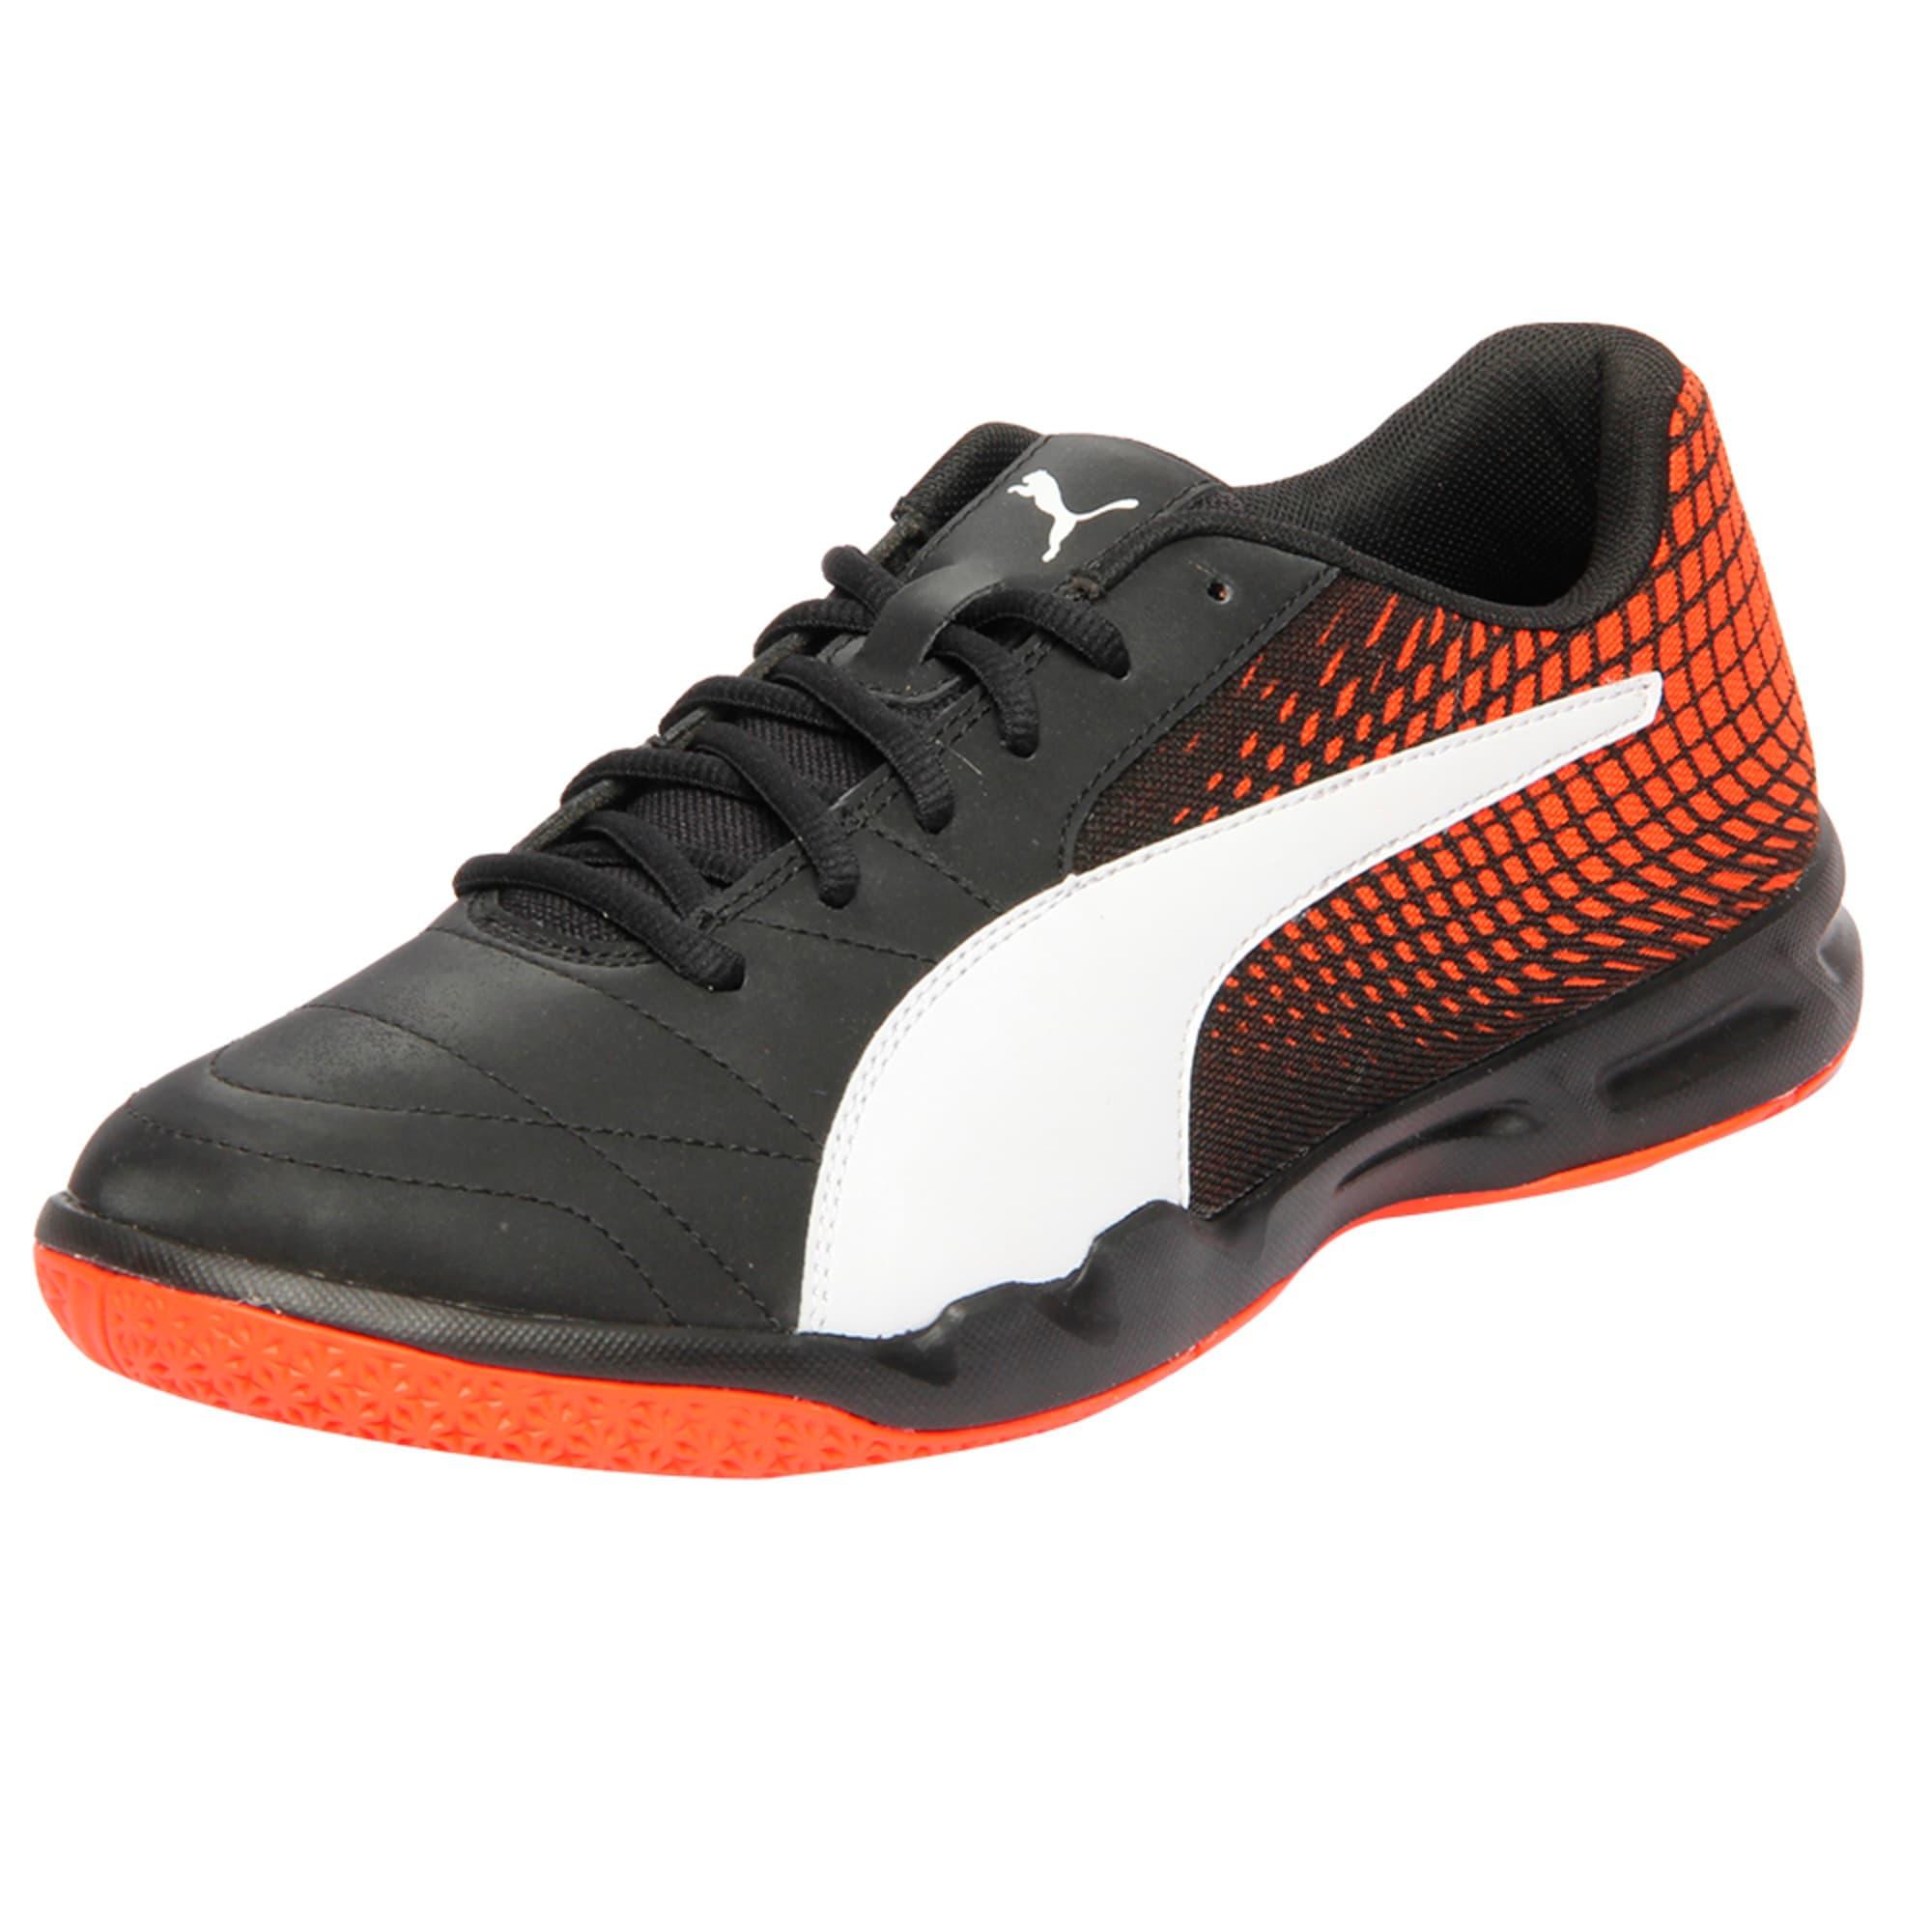 Thumbnail 1 of Veloz Indoor NG Training Shoes, Black-White-Cherry, medium-IND